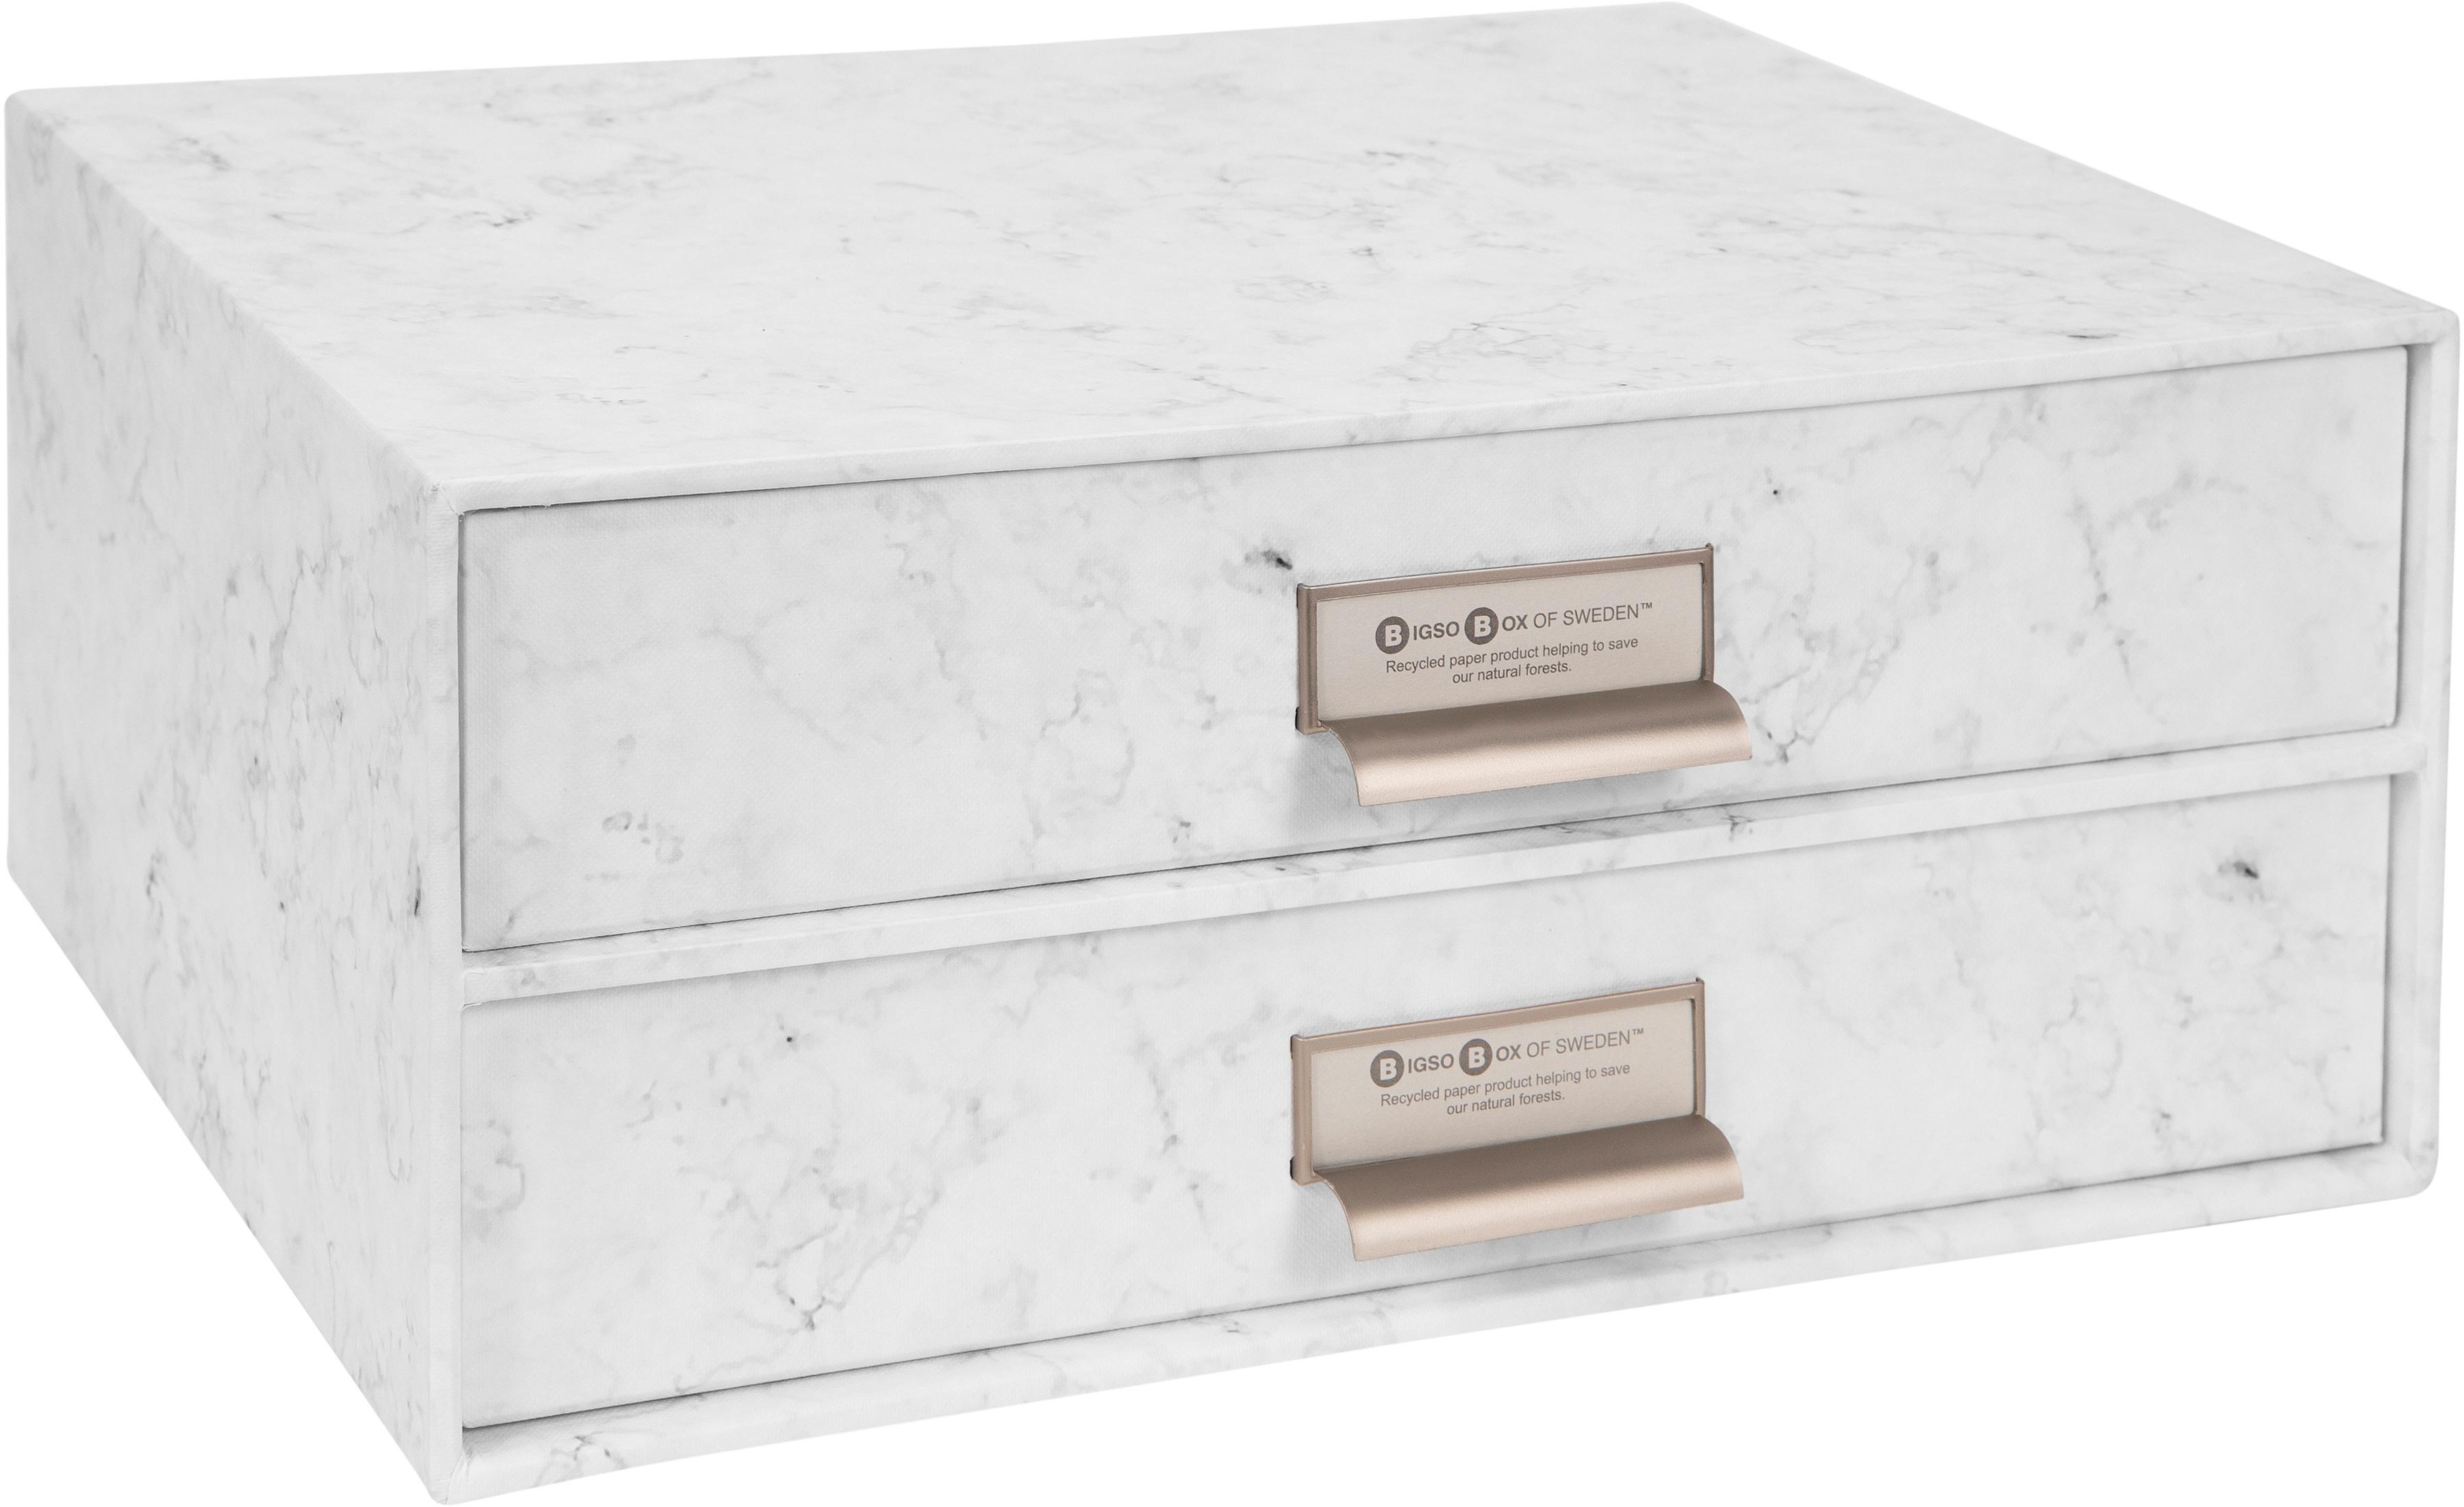 Büro-Organizer Birger, Organizer: Fester, laminierter Karto, Weiss, marmoriert, 33 x 15 cm